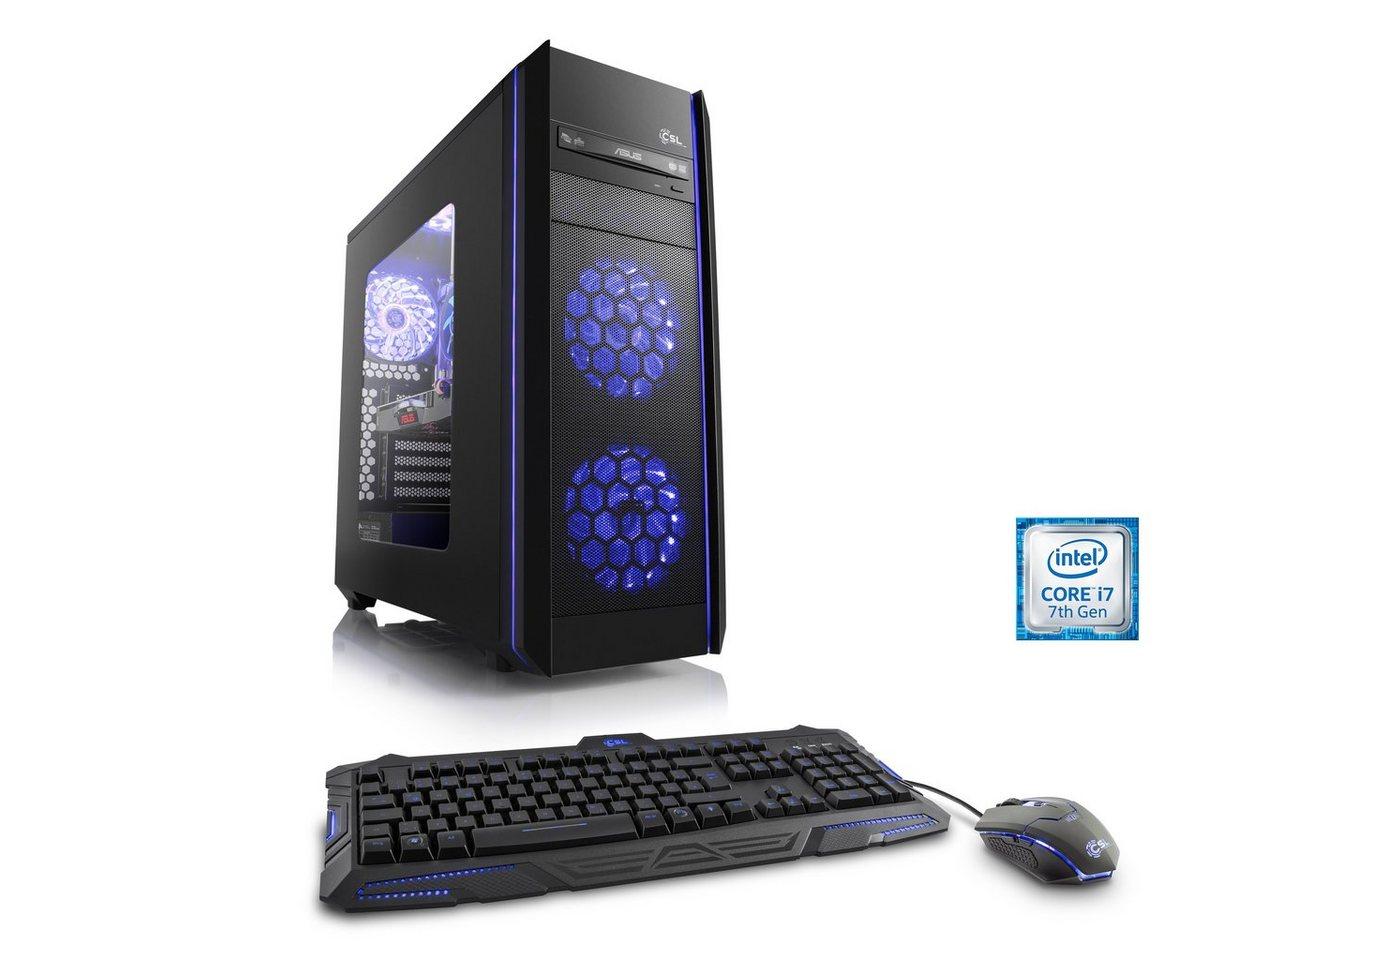 CSL Gaming PC   Core i7-7700   GTX 1060   16 GB DDR4 RAM   SSD »Speed T7567 Gamescom Edition« - Preisvergleich